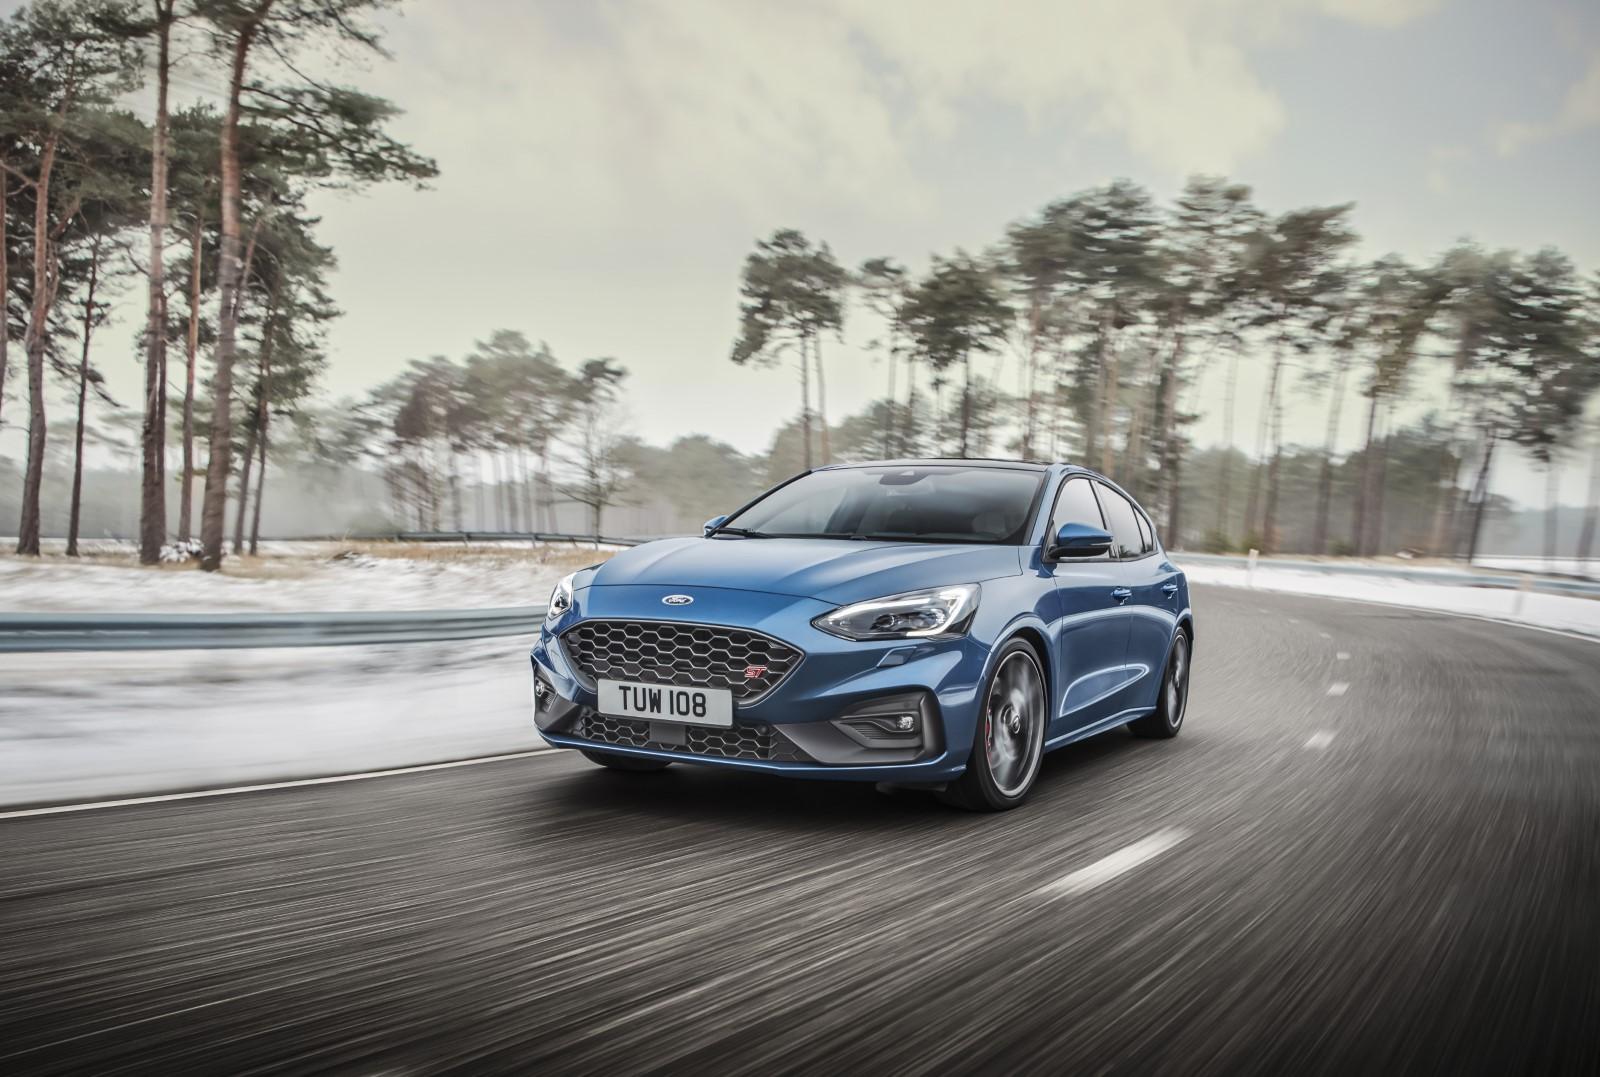 Премиера за новиот Ford Focus ST со 280 КС / ВИДЕО